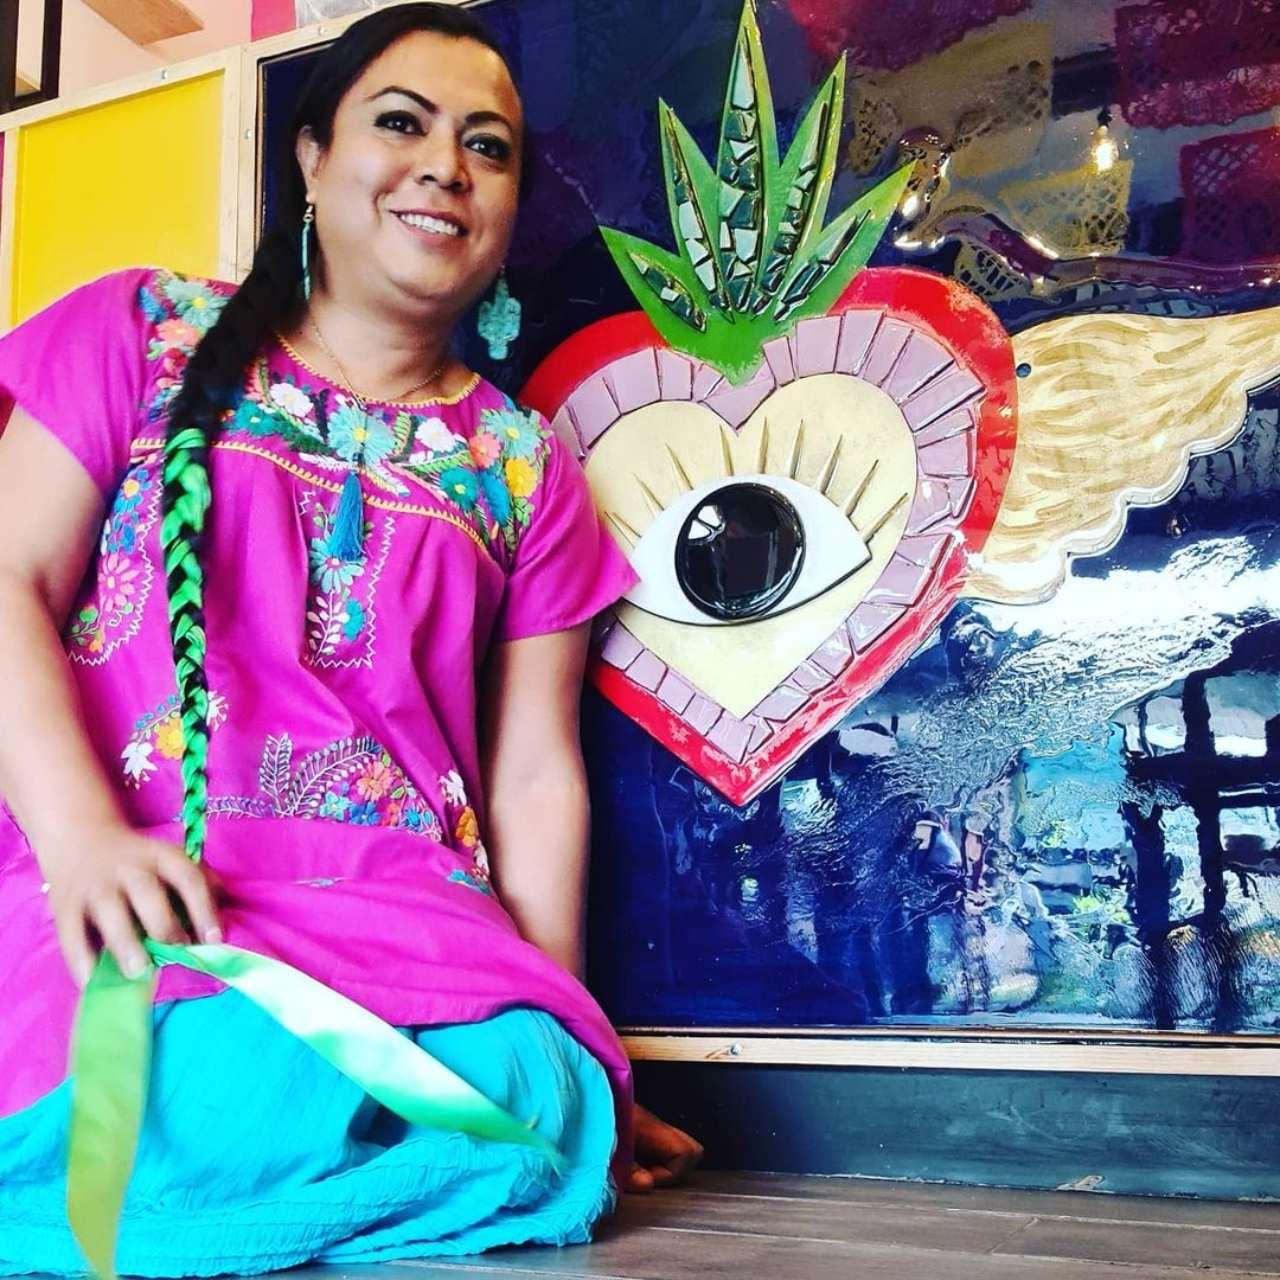 Lady tacos de canasta exige 200 mil restaurante